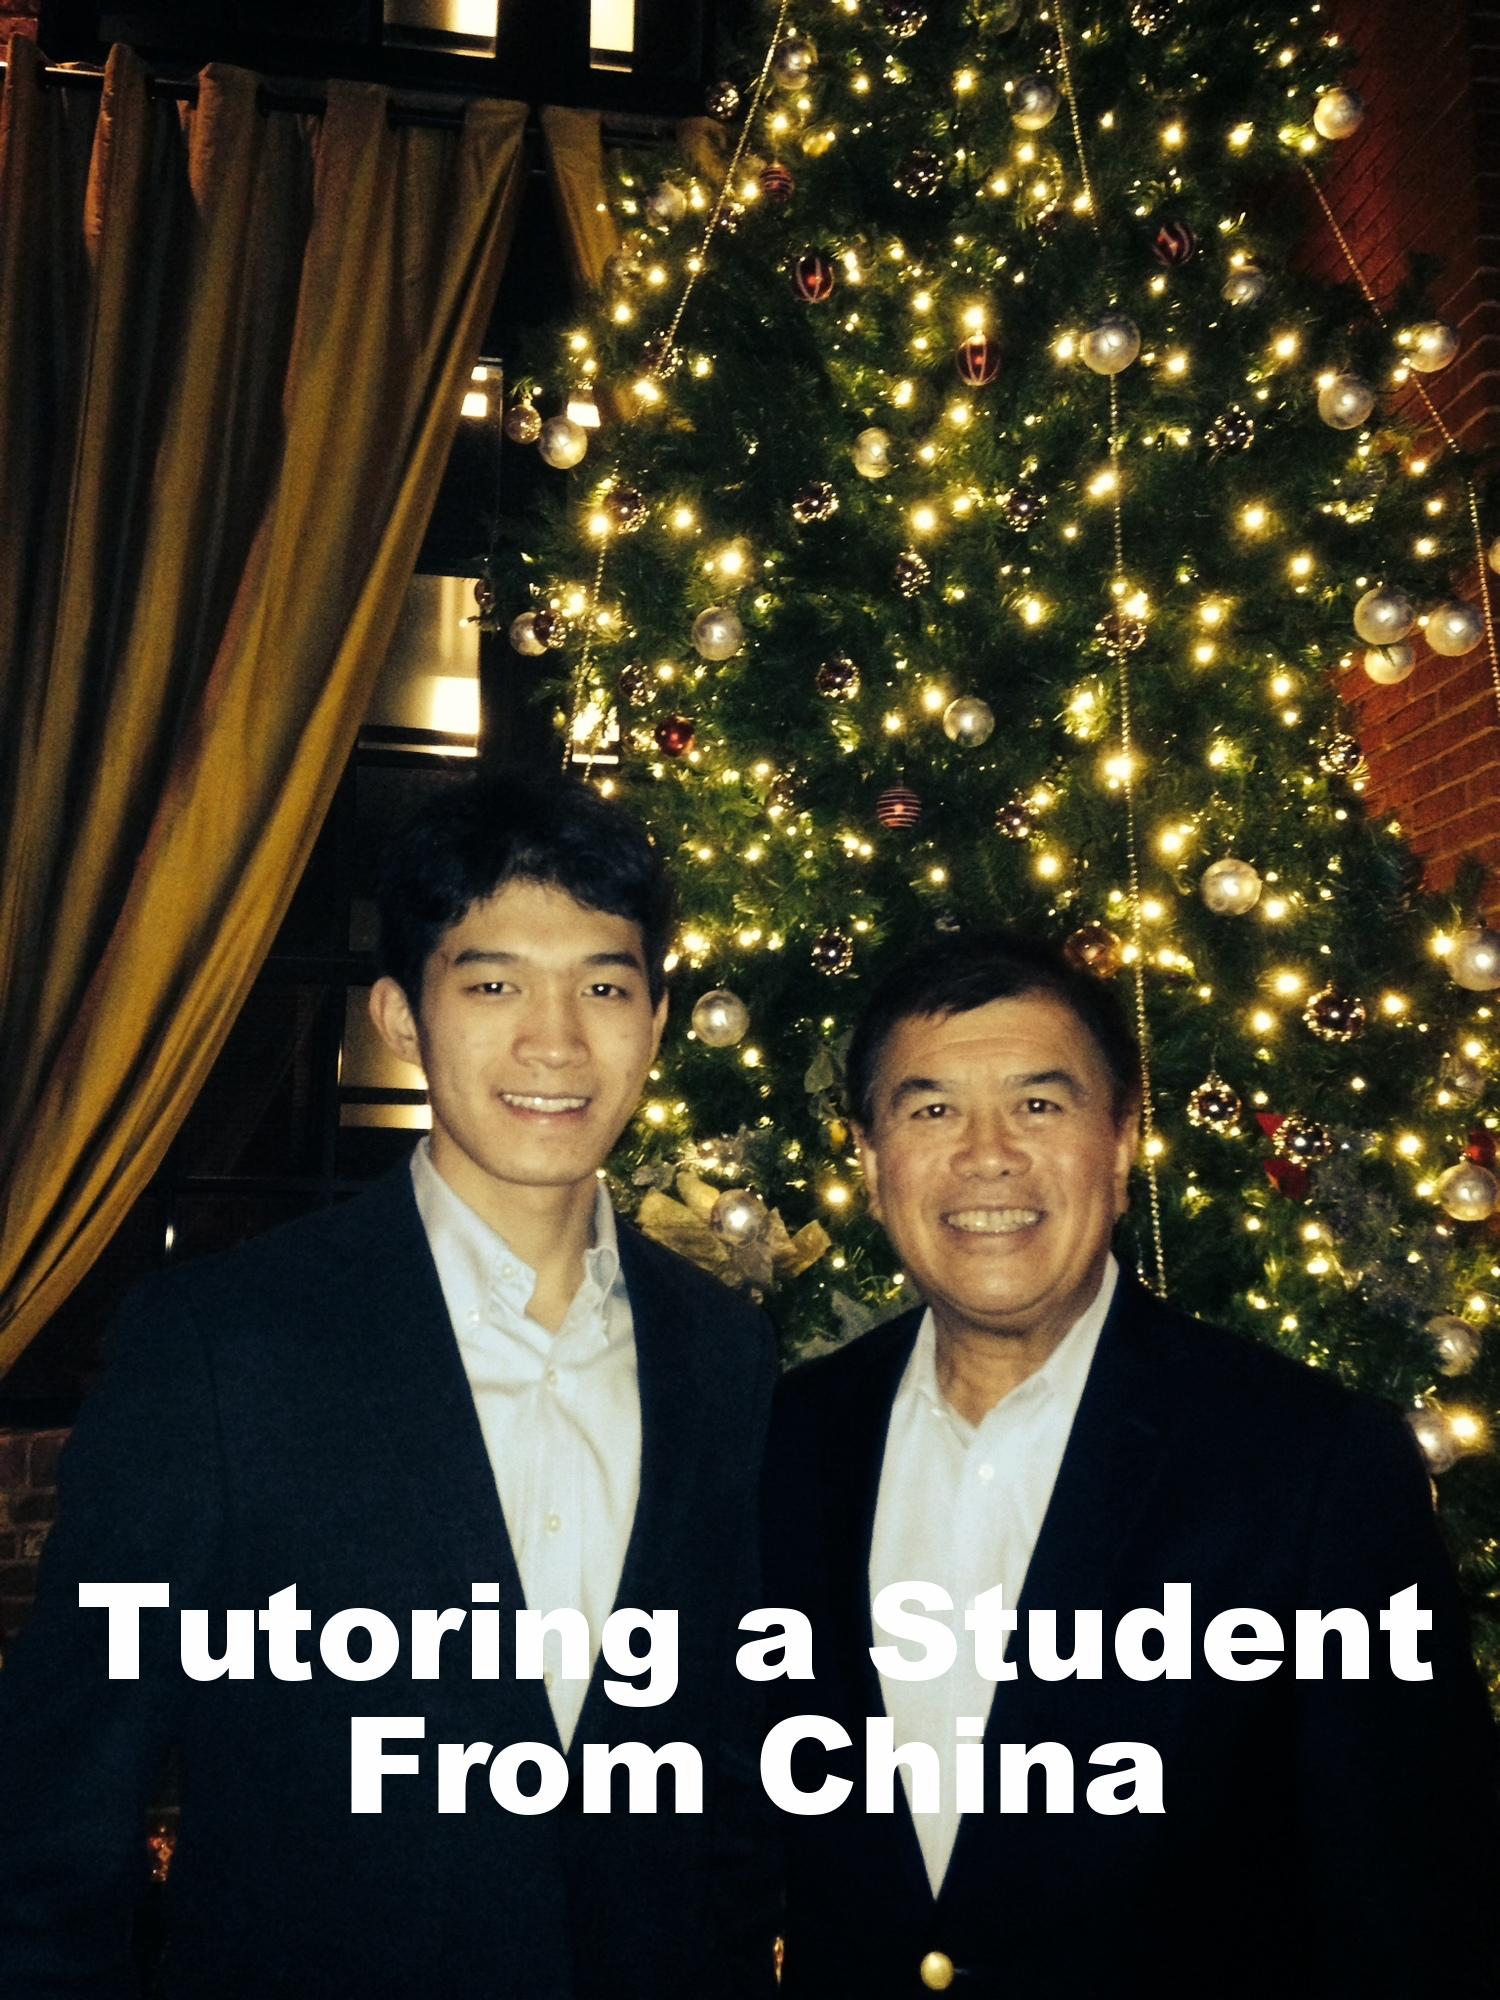 David Wu Tutoring a Student From China